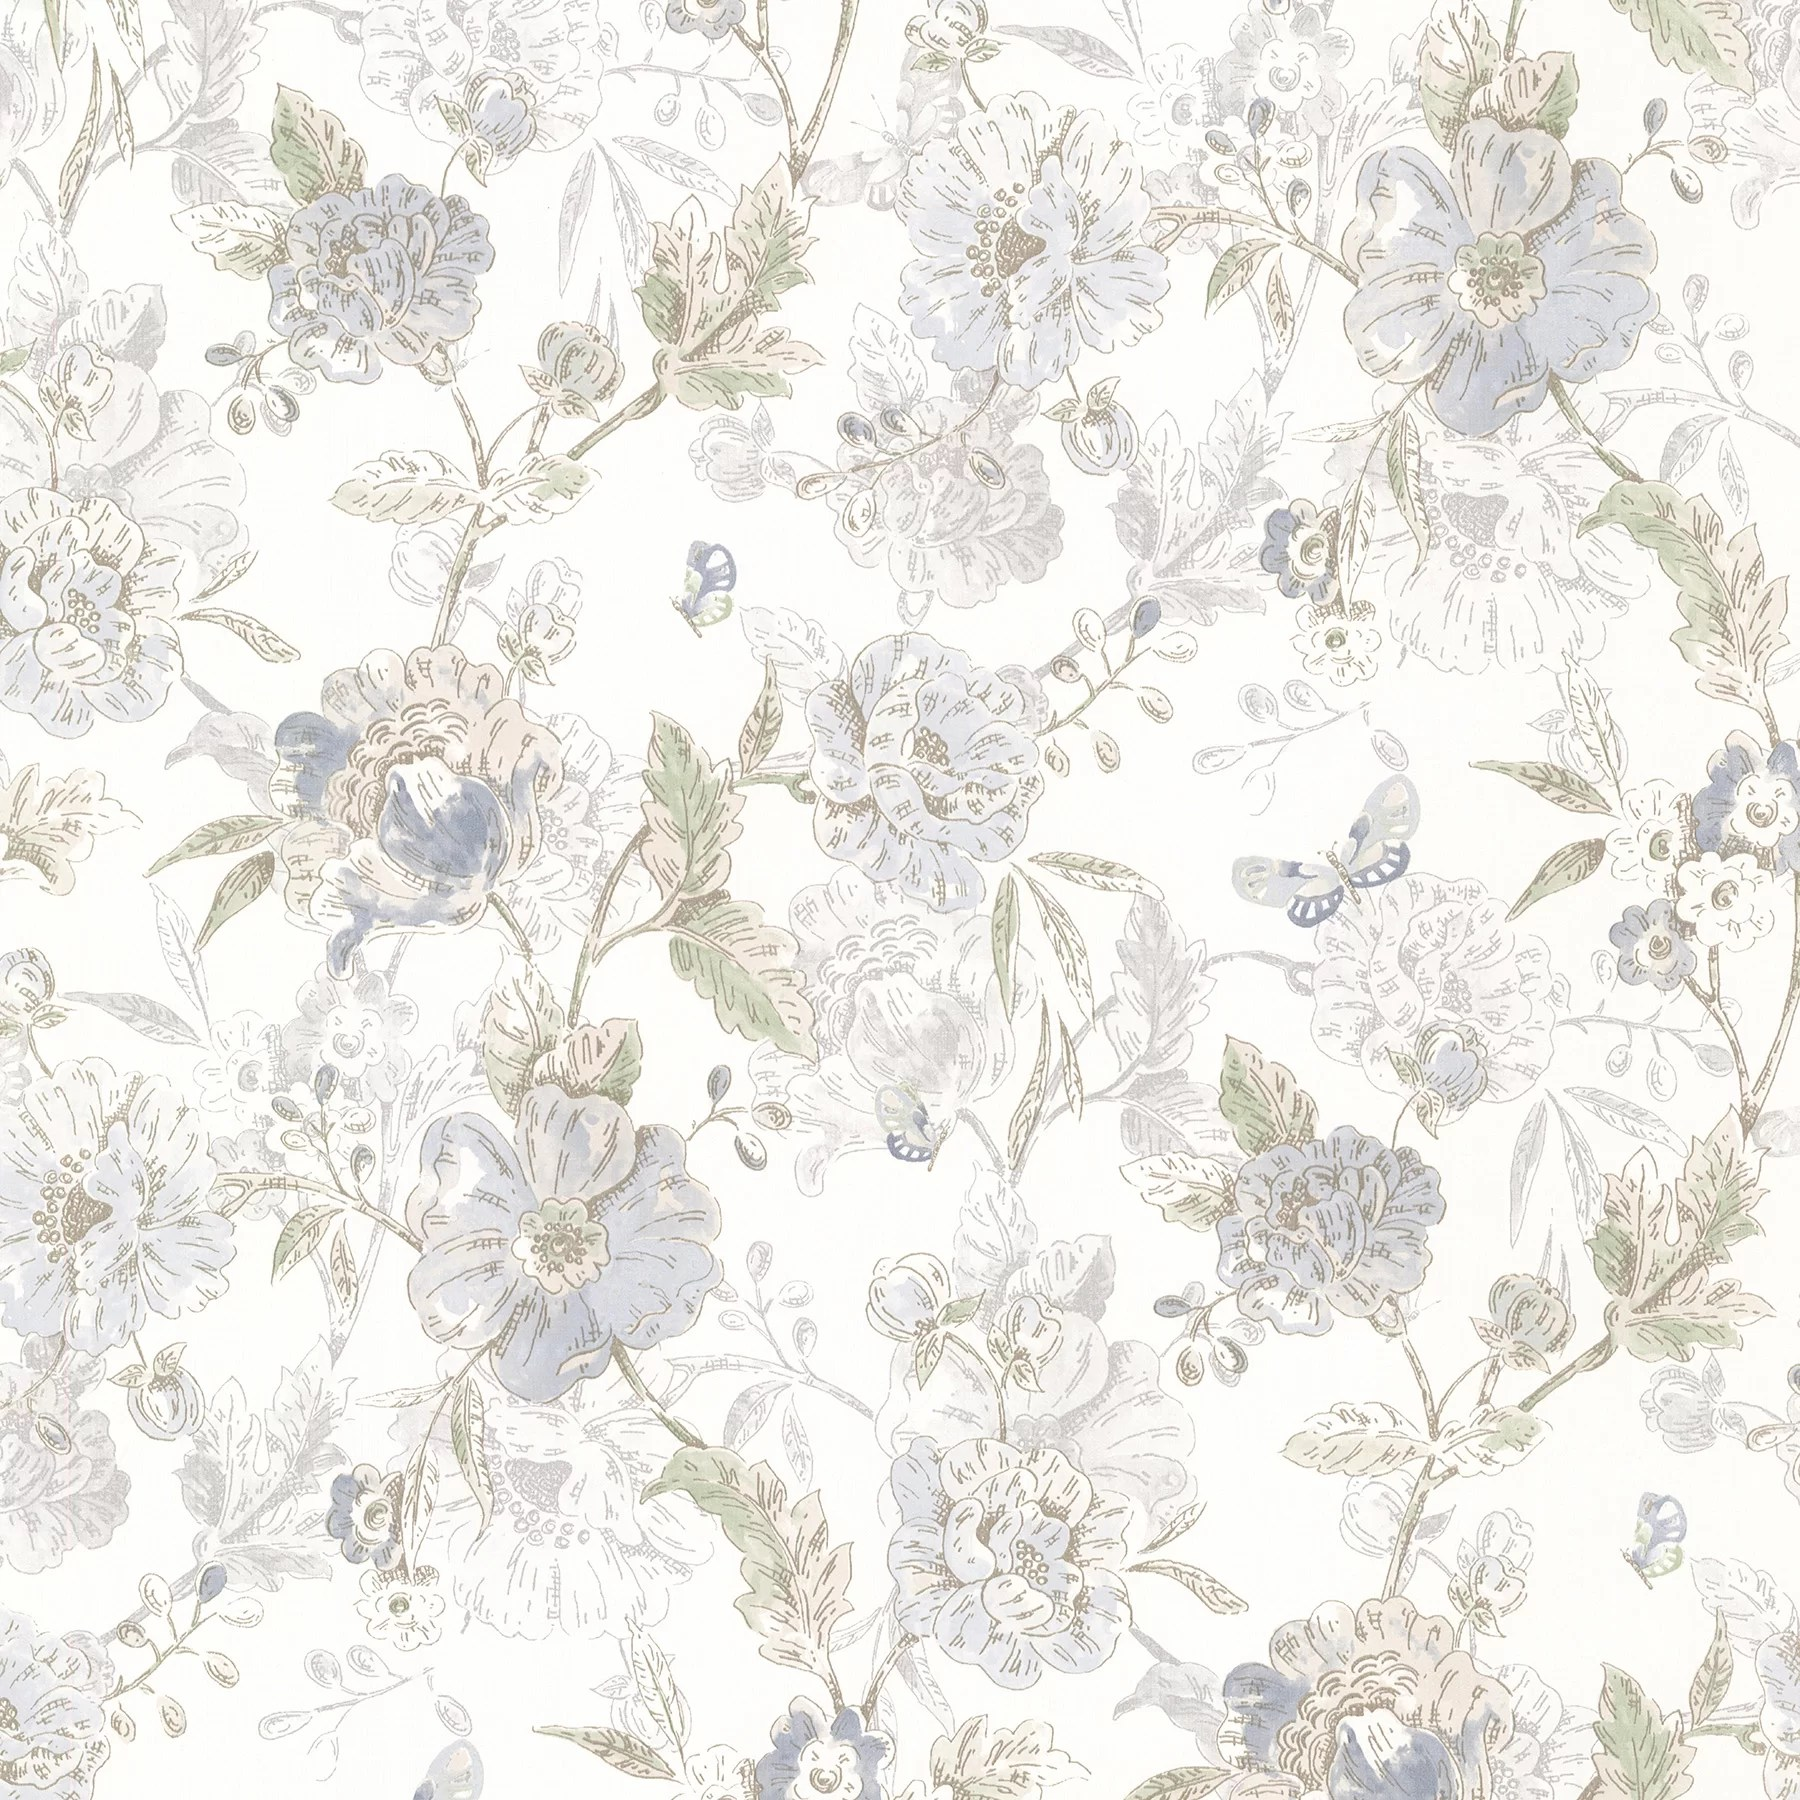 Ophelia Co Jianyu 33 X 20 5 Butterfly Peony Trail Vintage Wallpaper Roll Reviews Wayfair